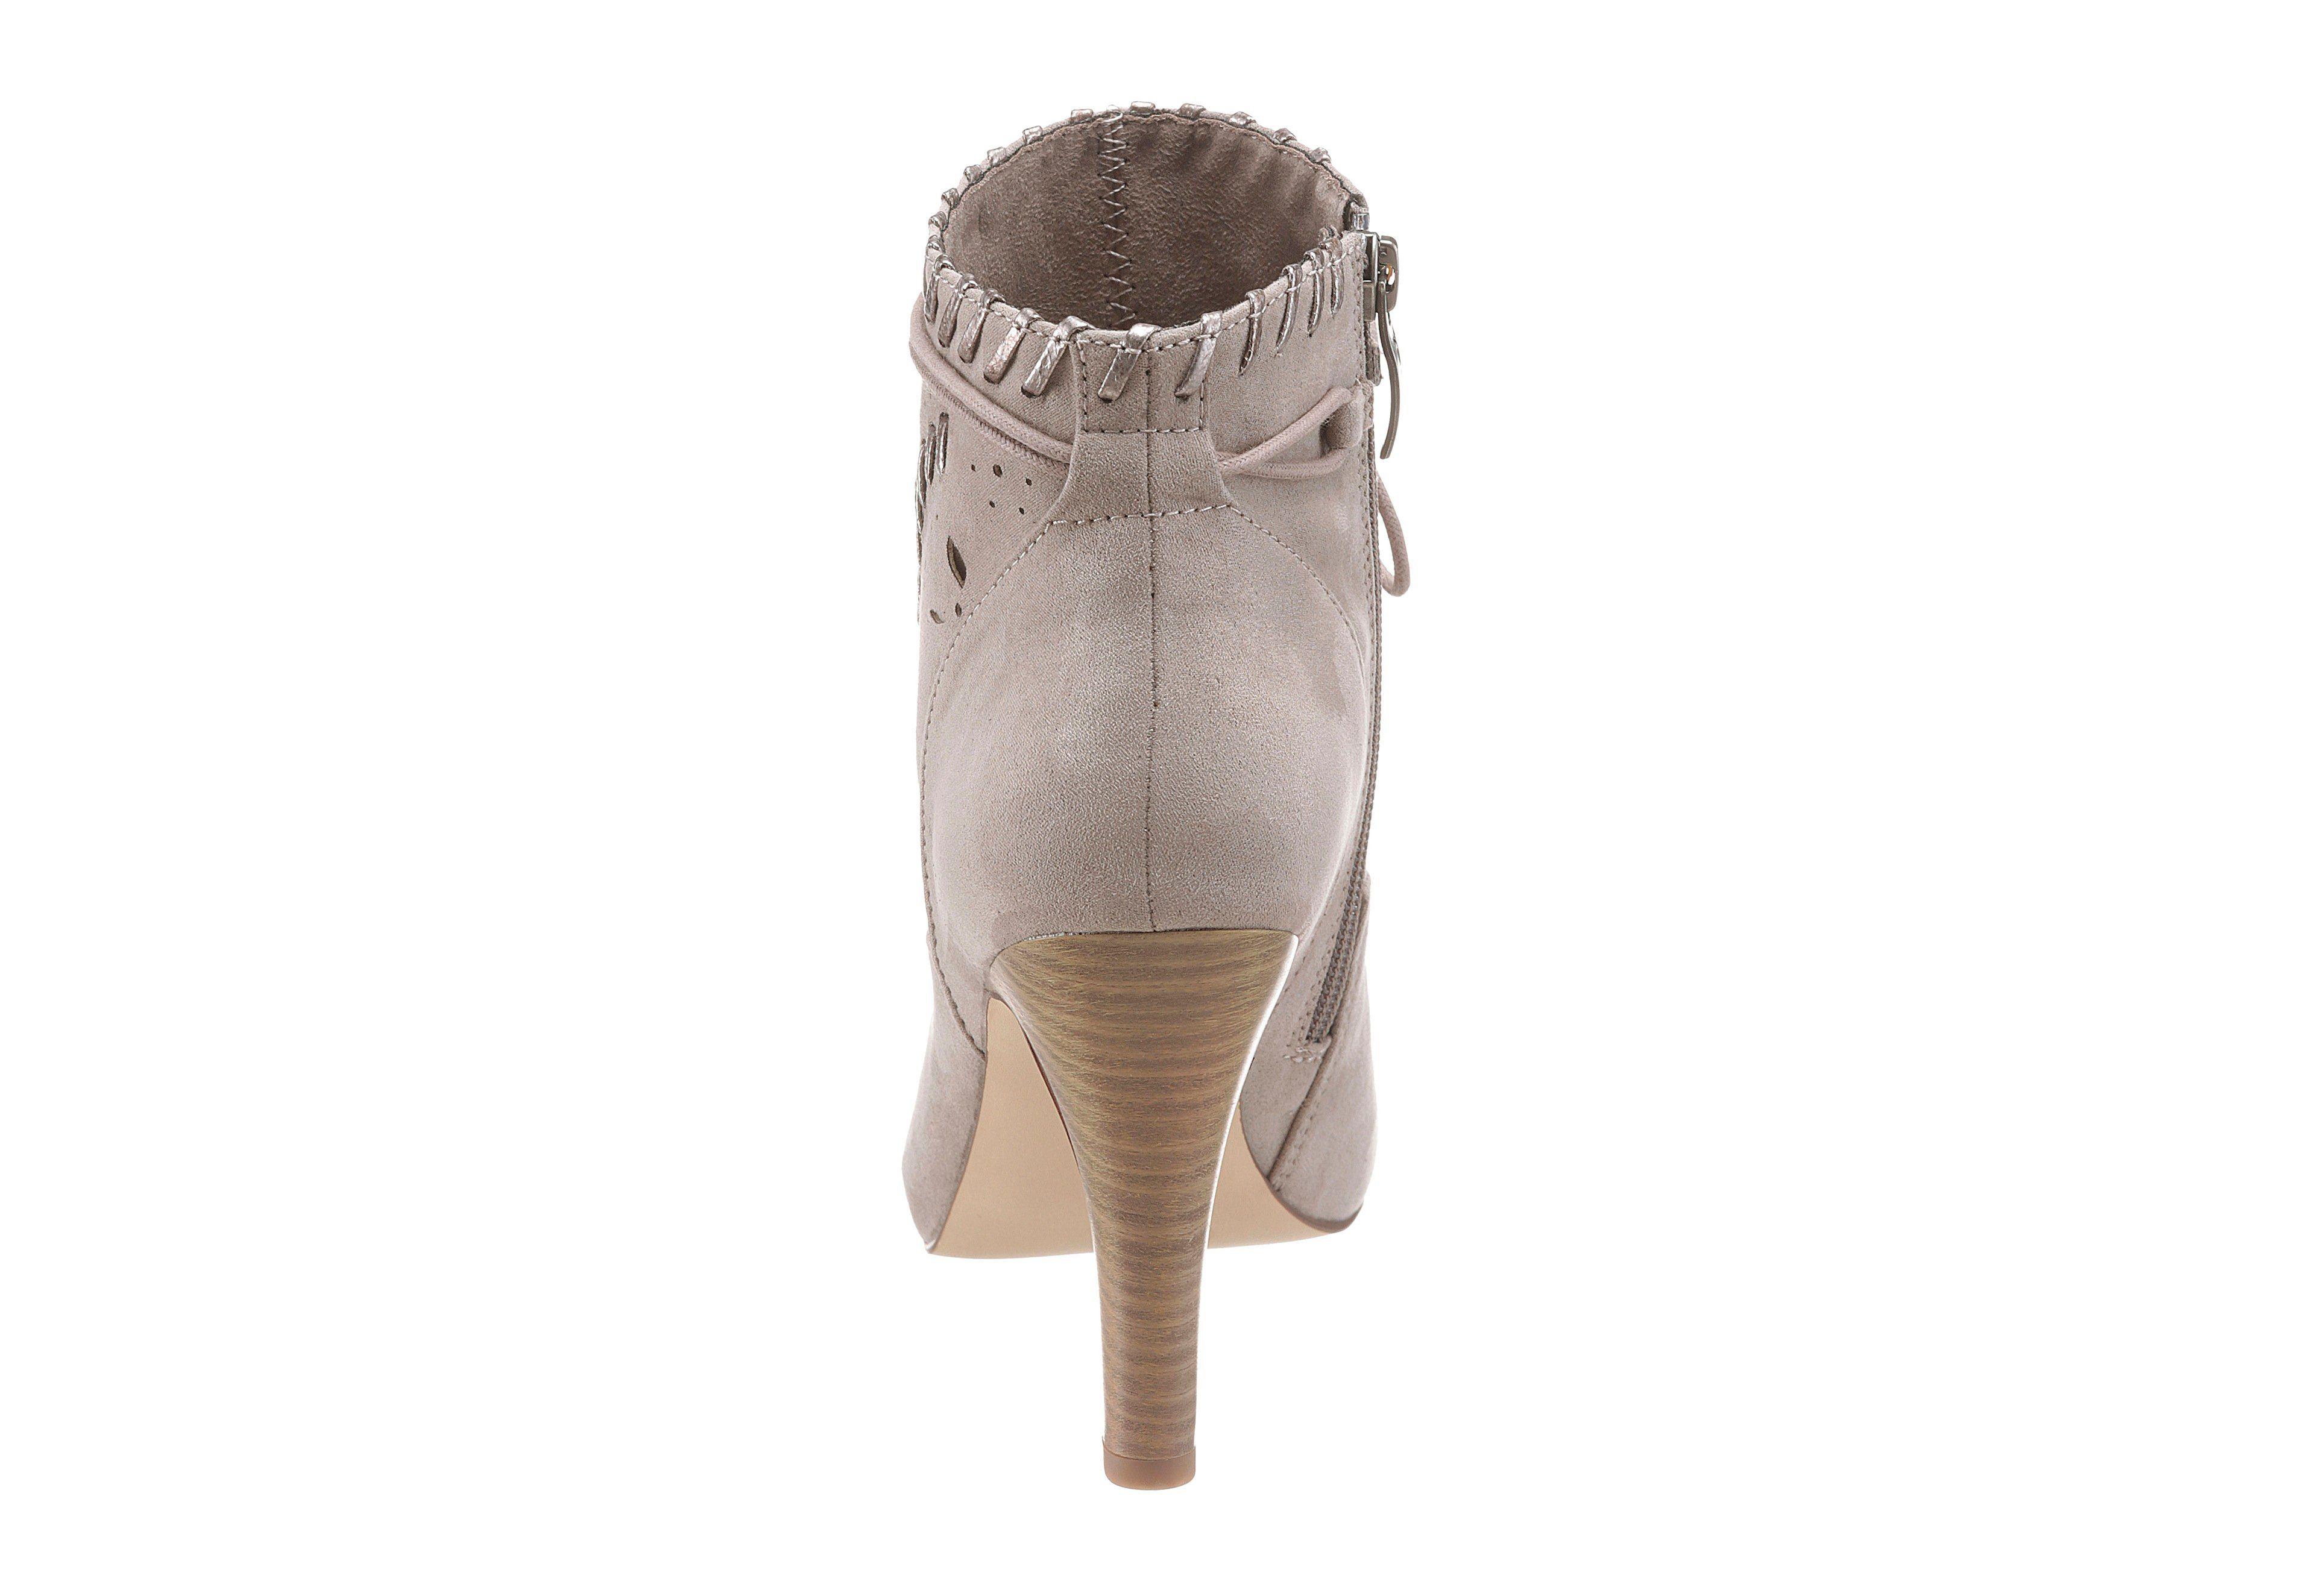 Tamaris High-Heel-Stiefelette, im Boho-Style  helltaupe